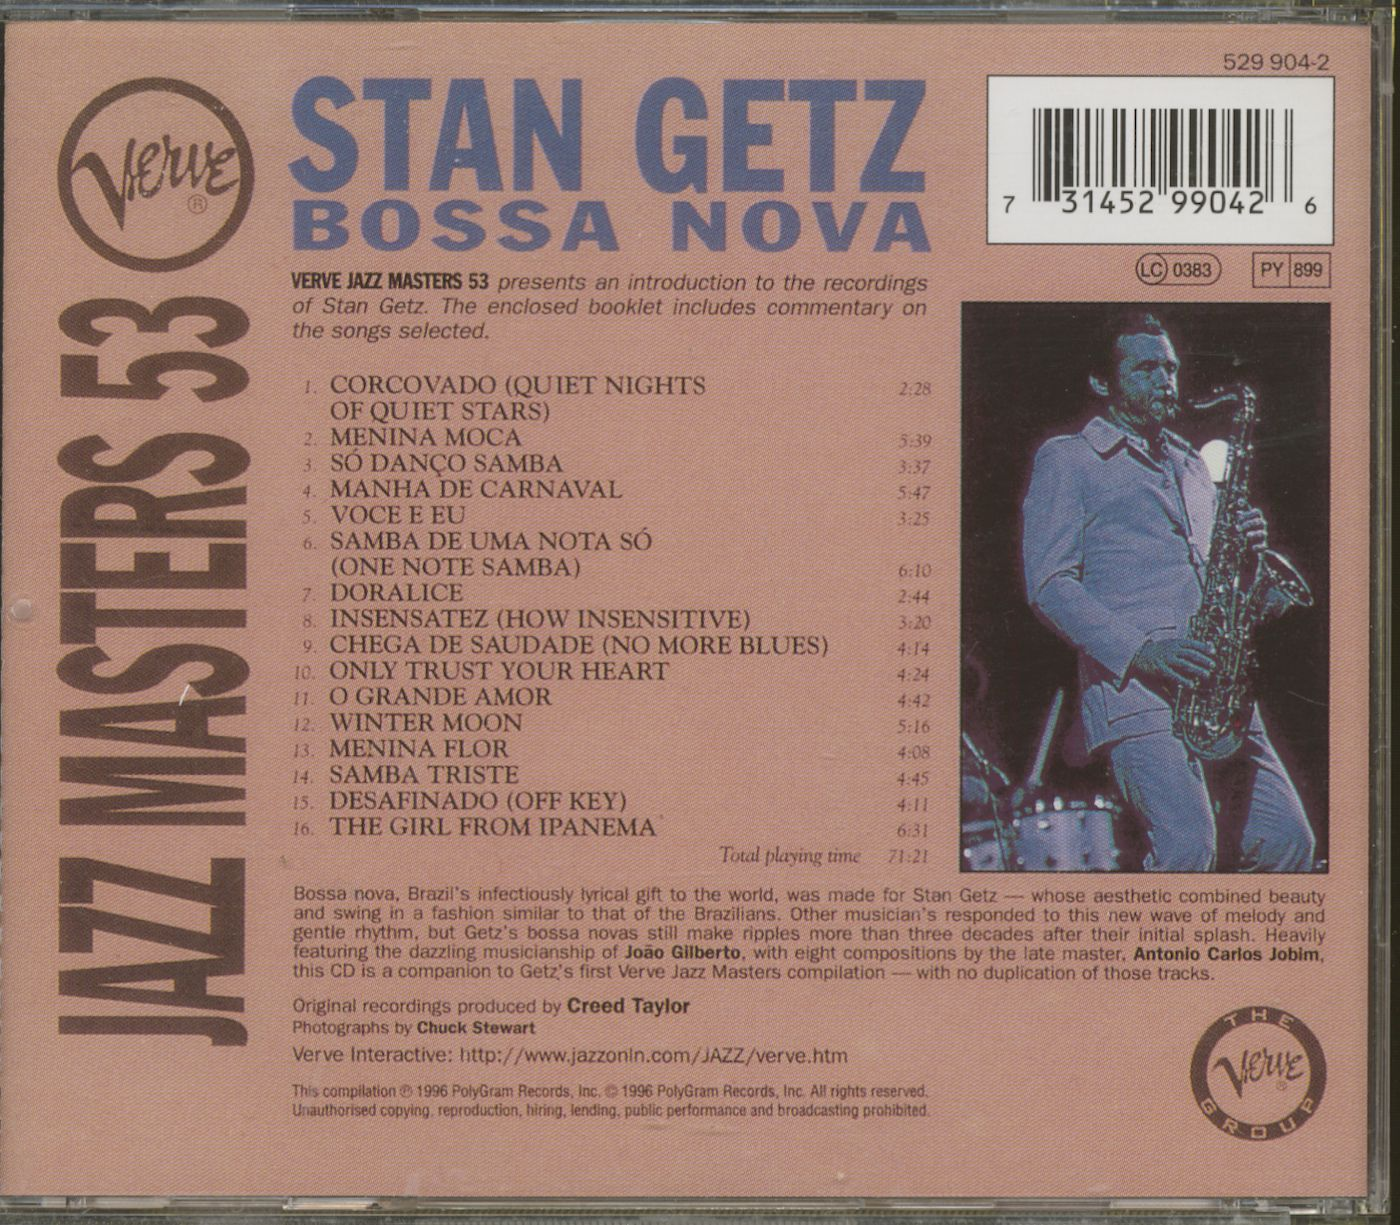 Stan Getz Cd Bossa Nova Verve Jazz Masters 53 Cd